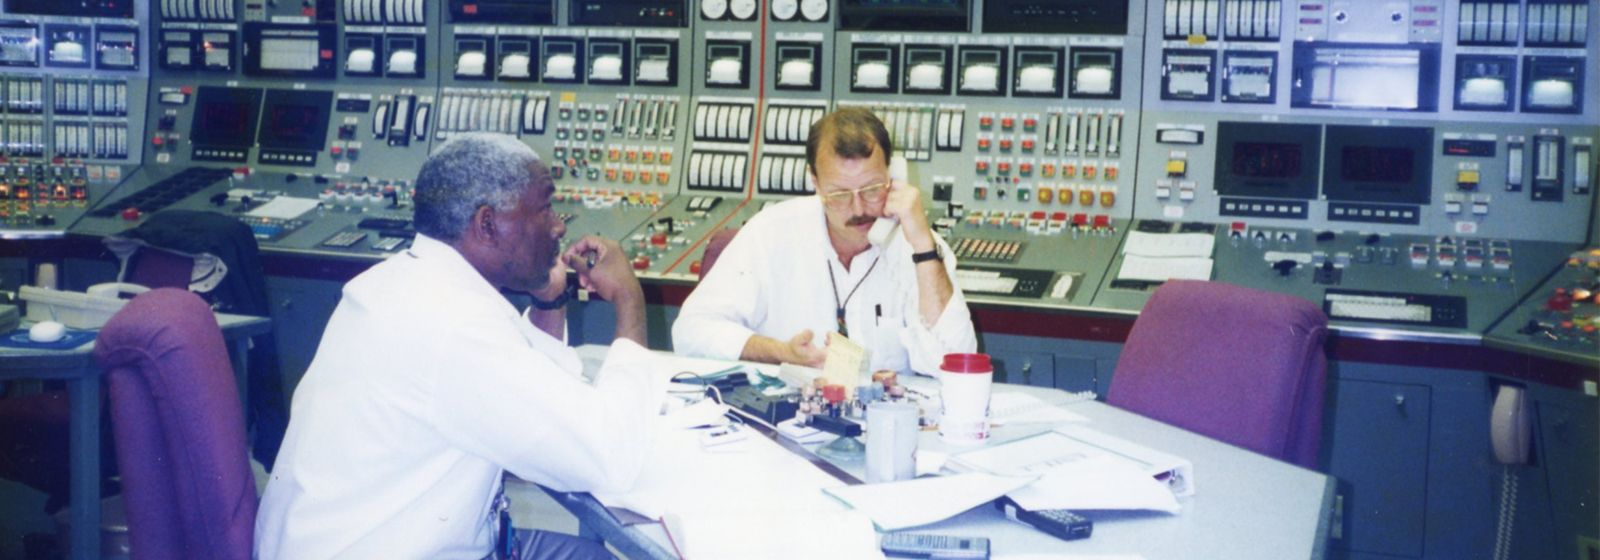 Retro photos: Teamwork through the years